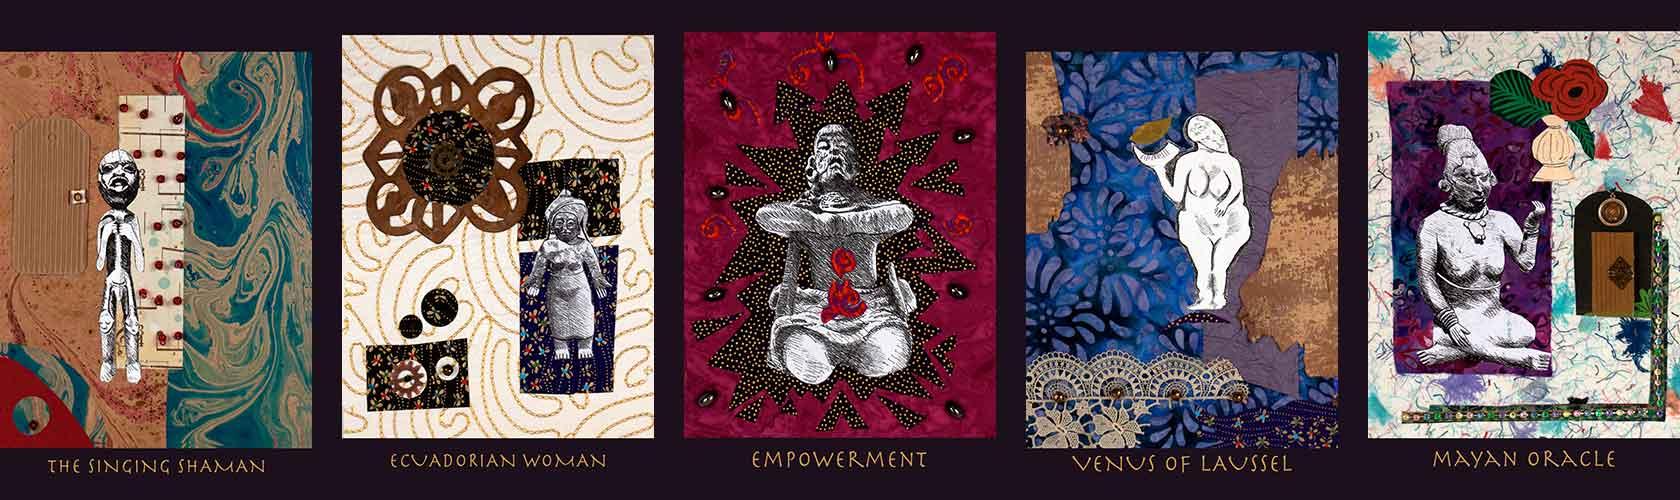 Selection of Belinda Gore's collage artwork showing ritual postures.